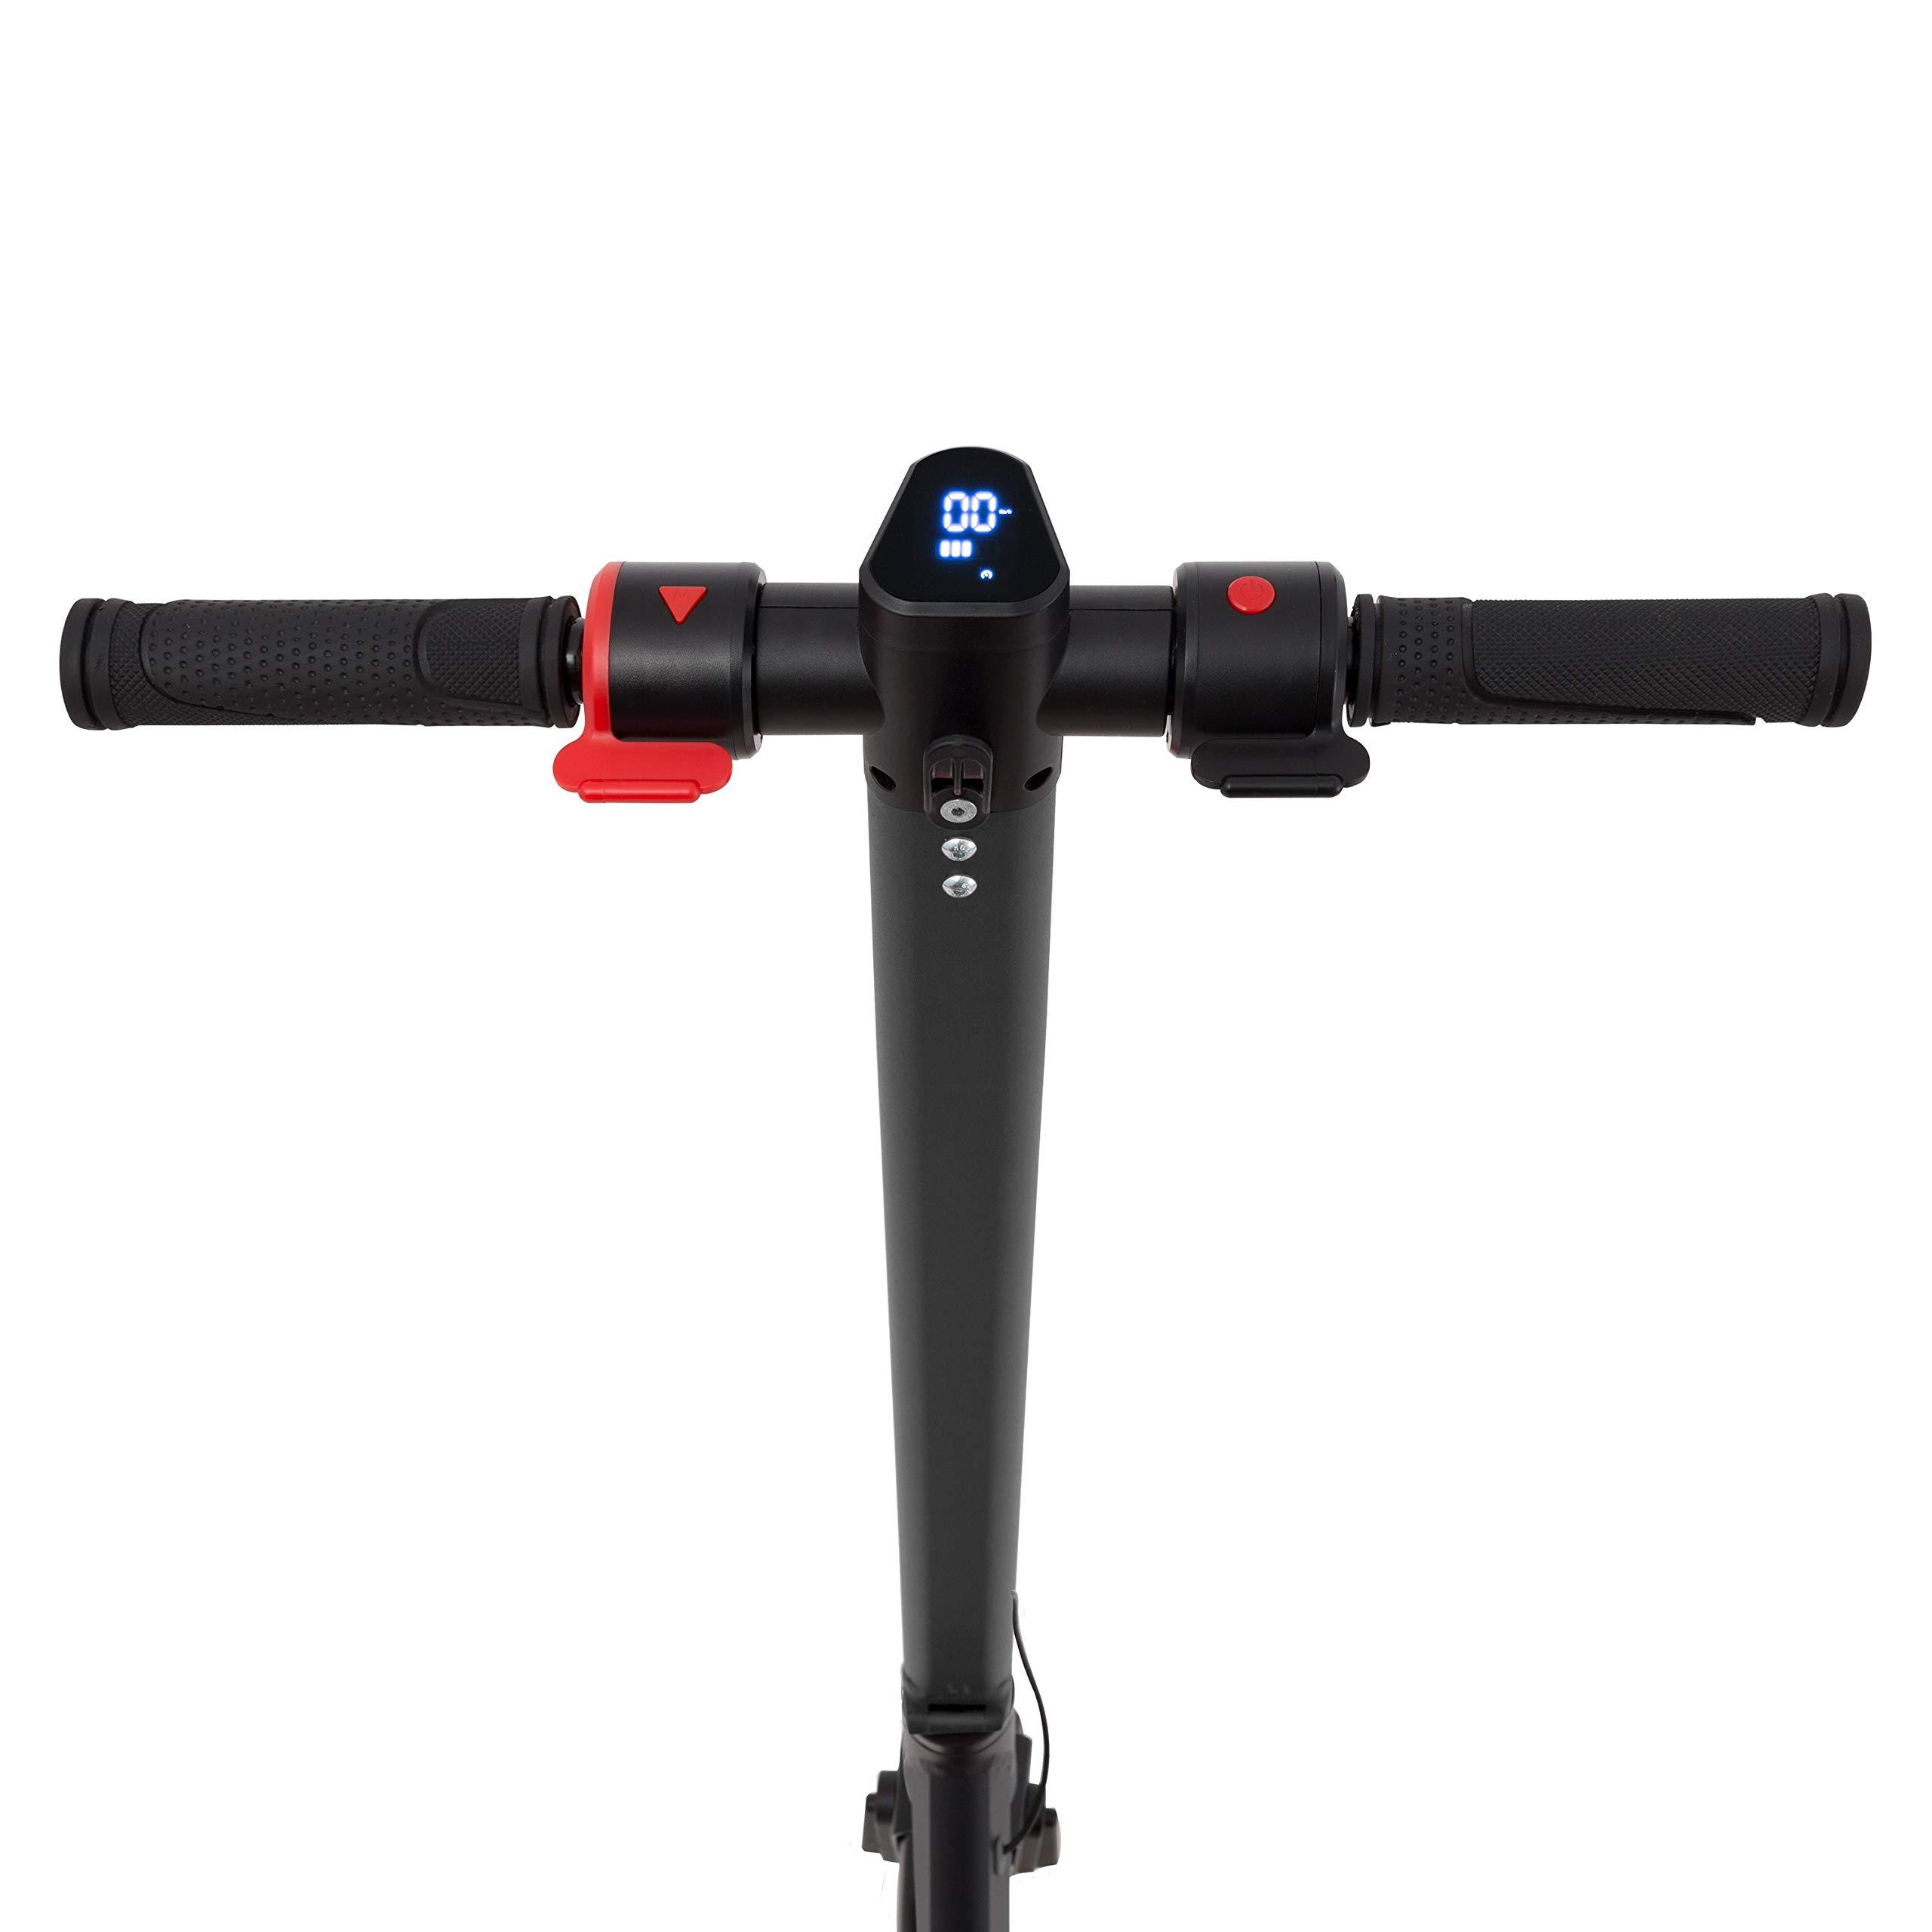 Comprar Ecogyro GScooter S6 Black Scooter-Patinete eléctrico, Juventud Unisex, Talla Única